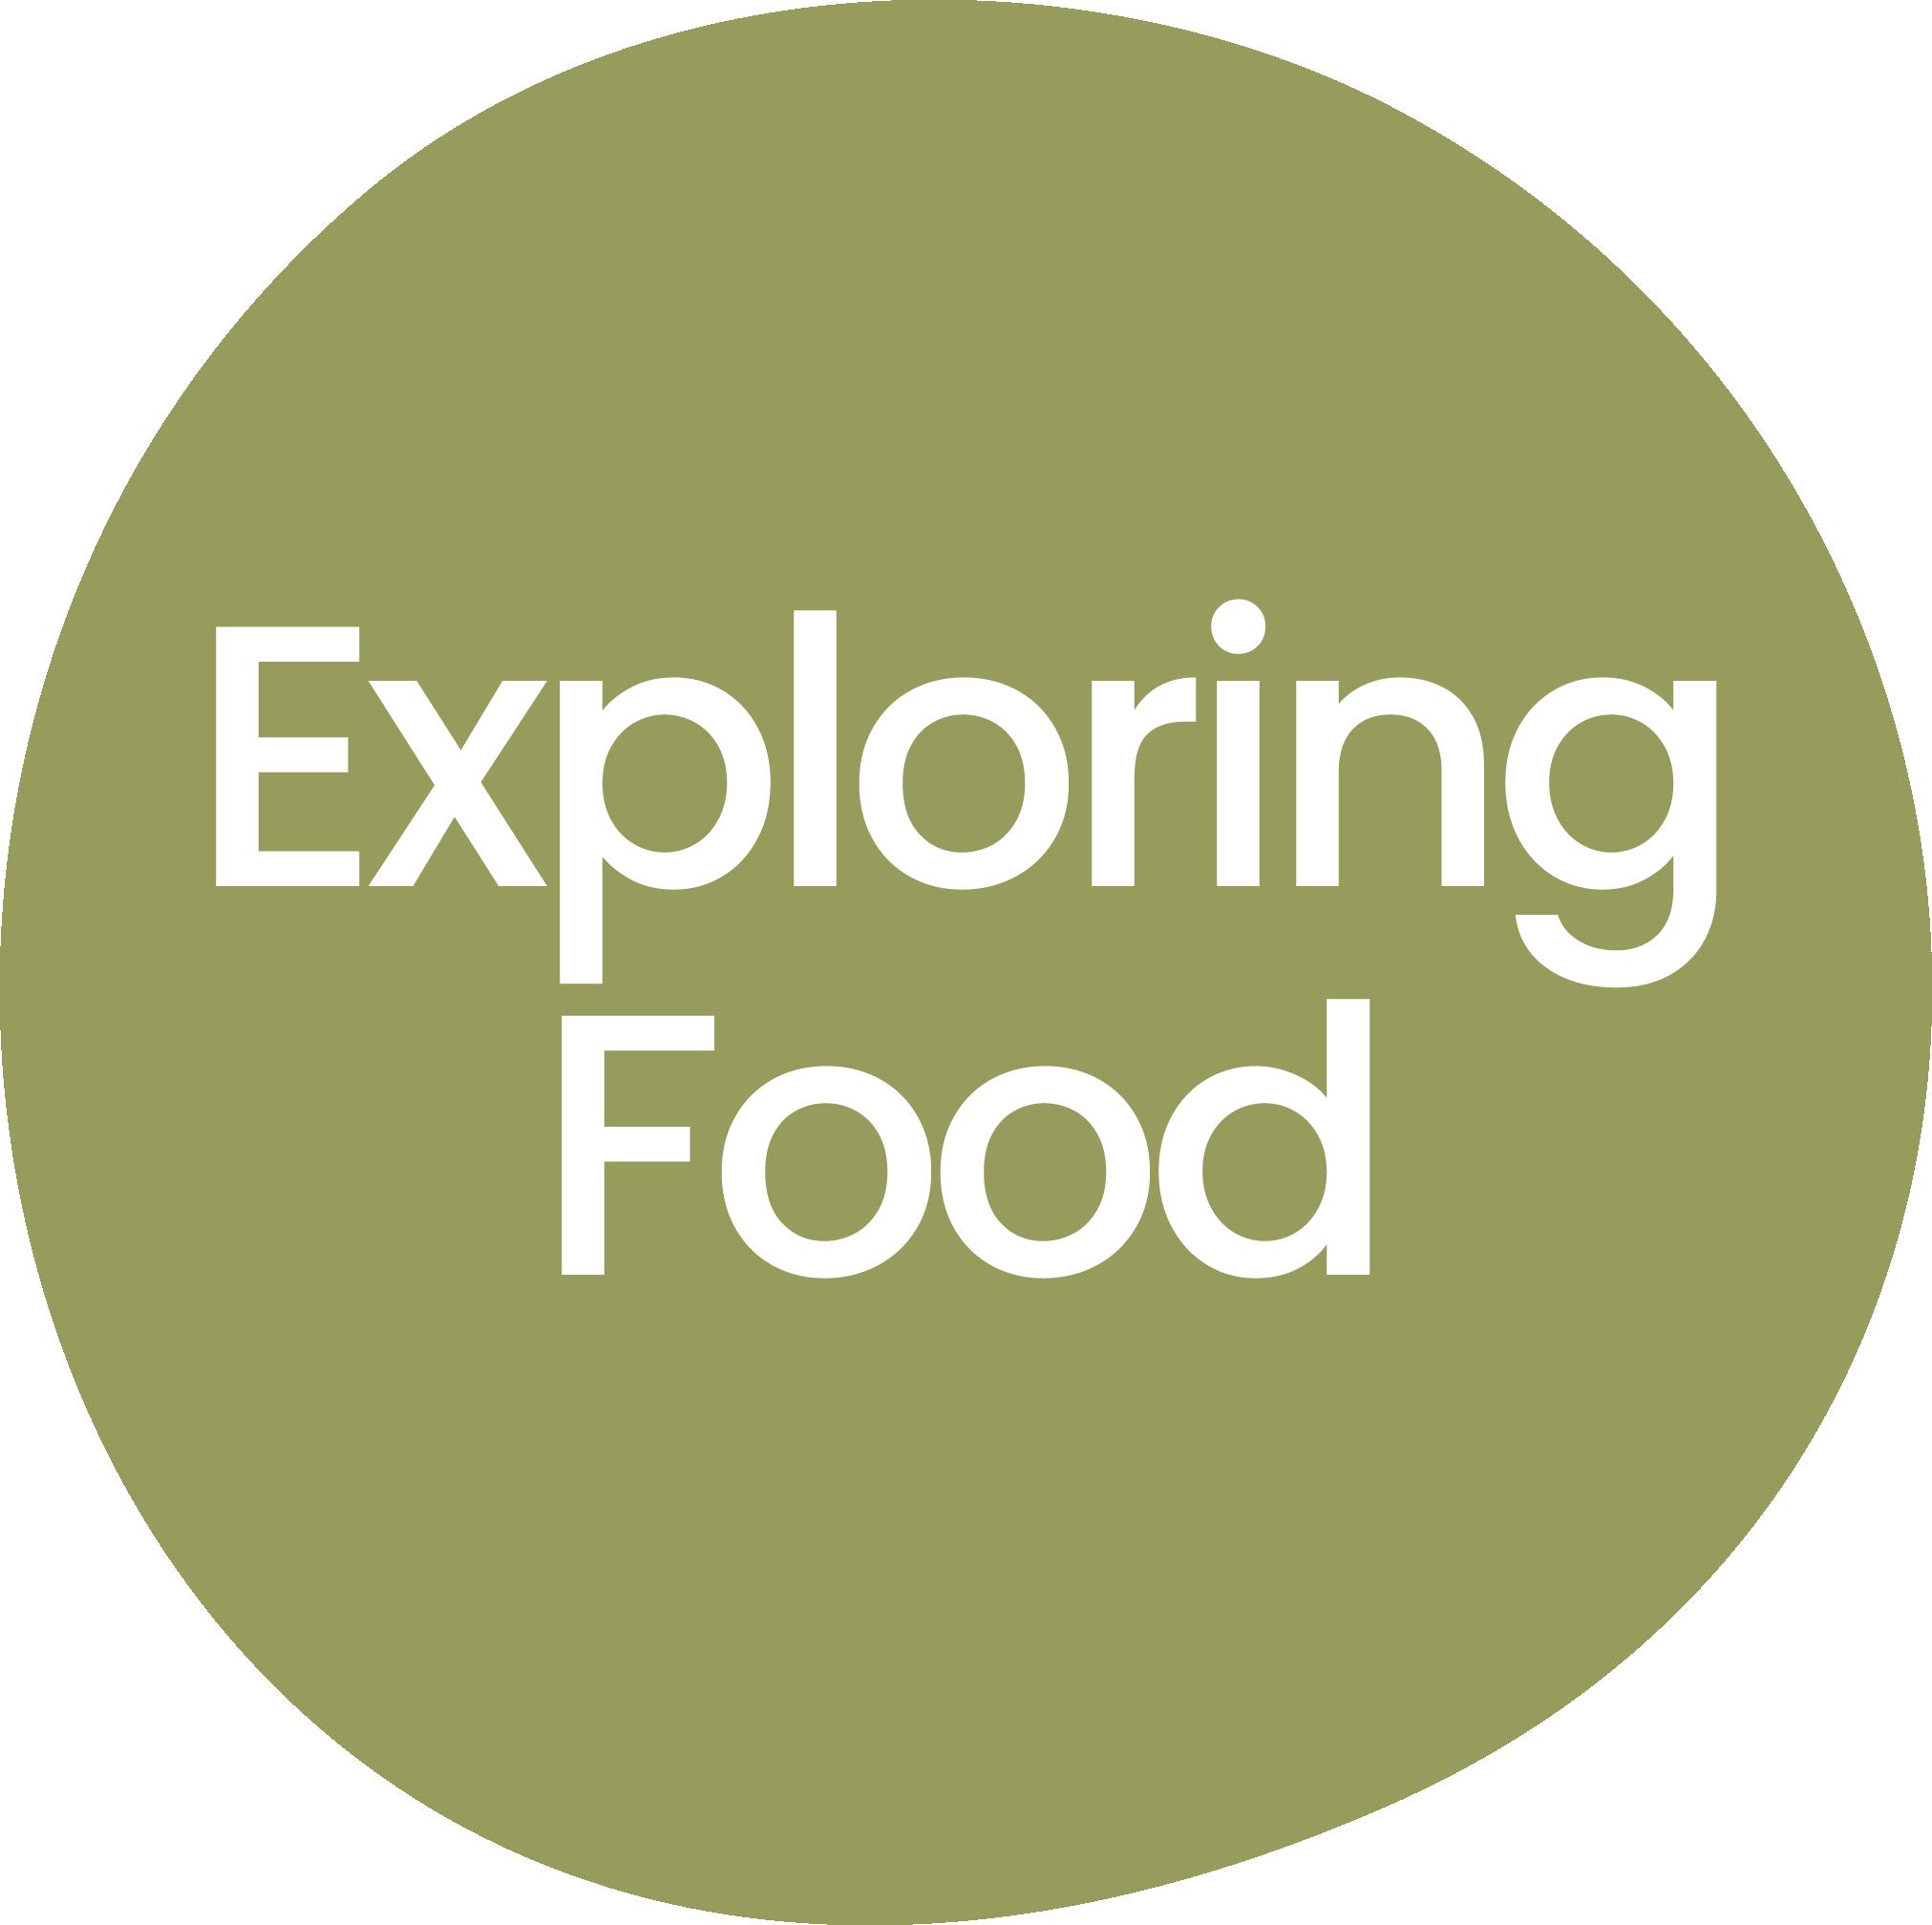 Exploring-Food-circle